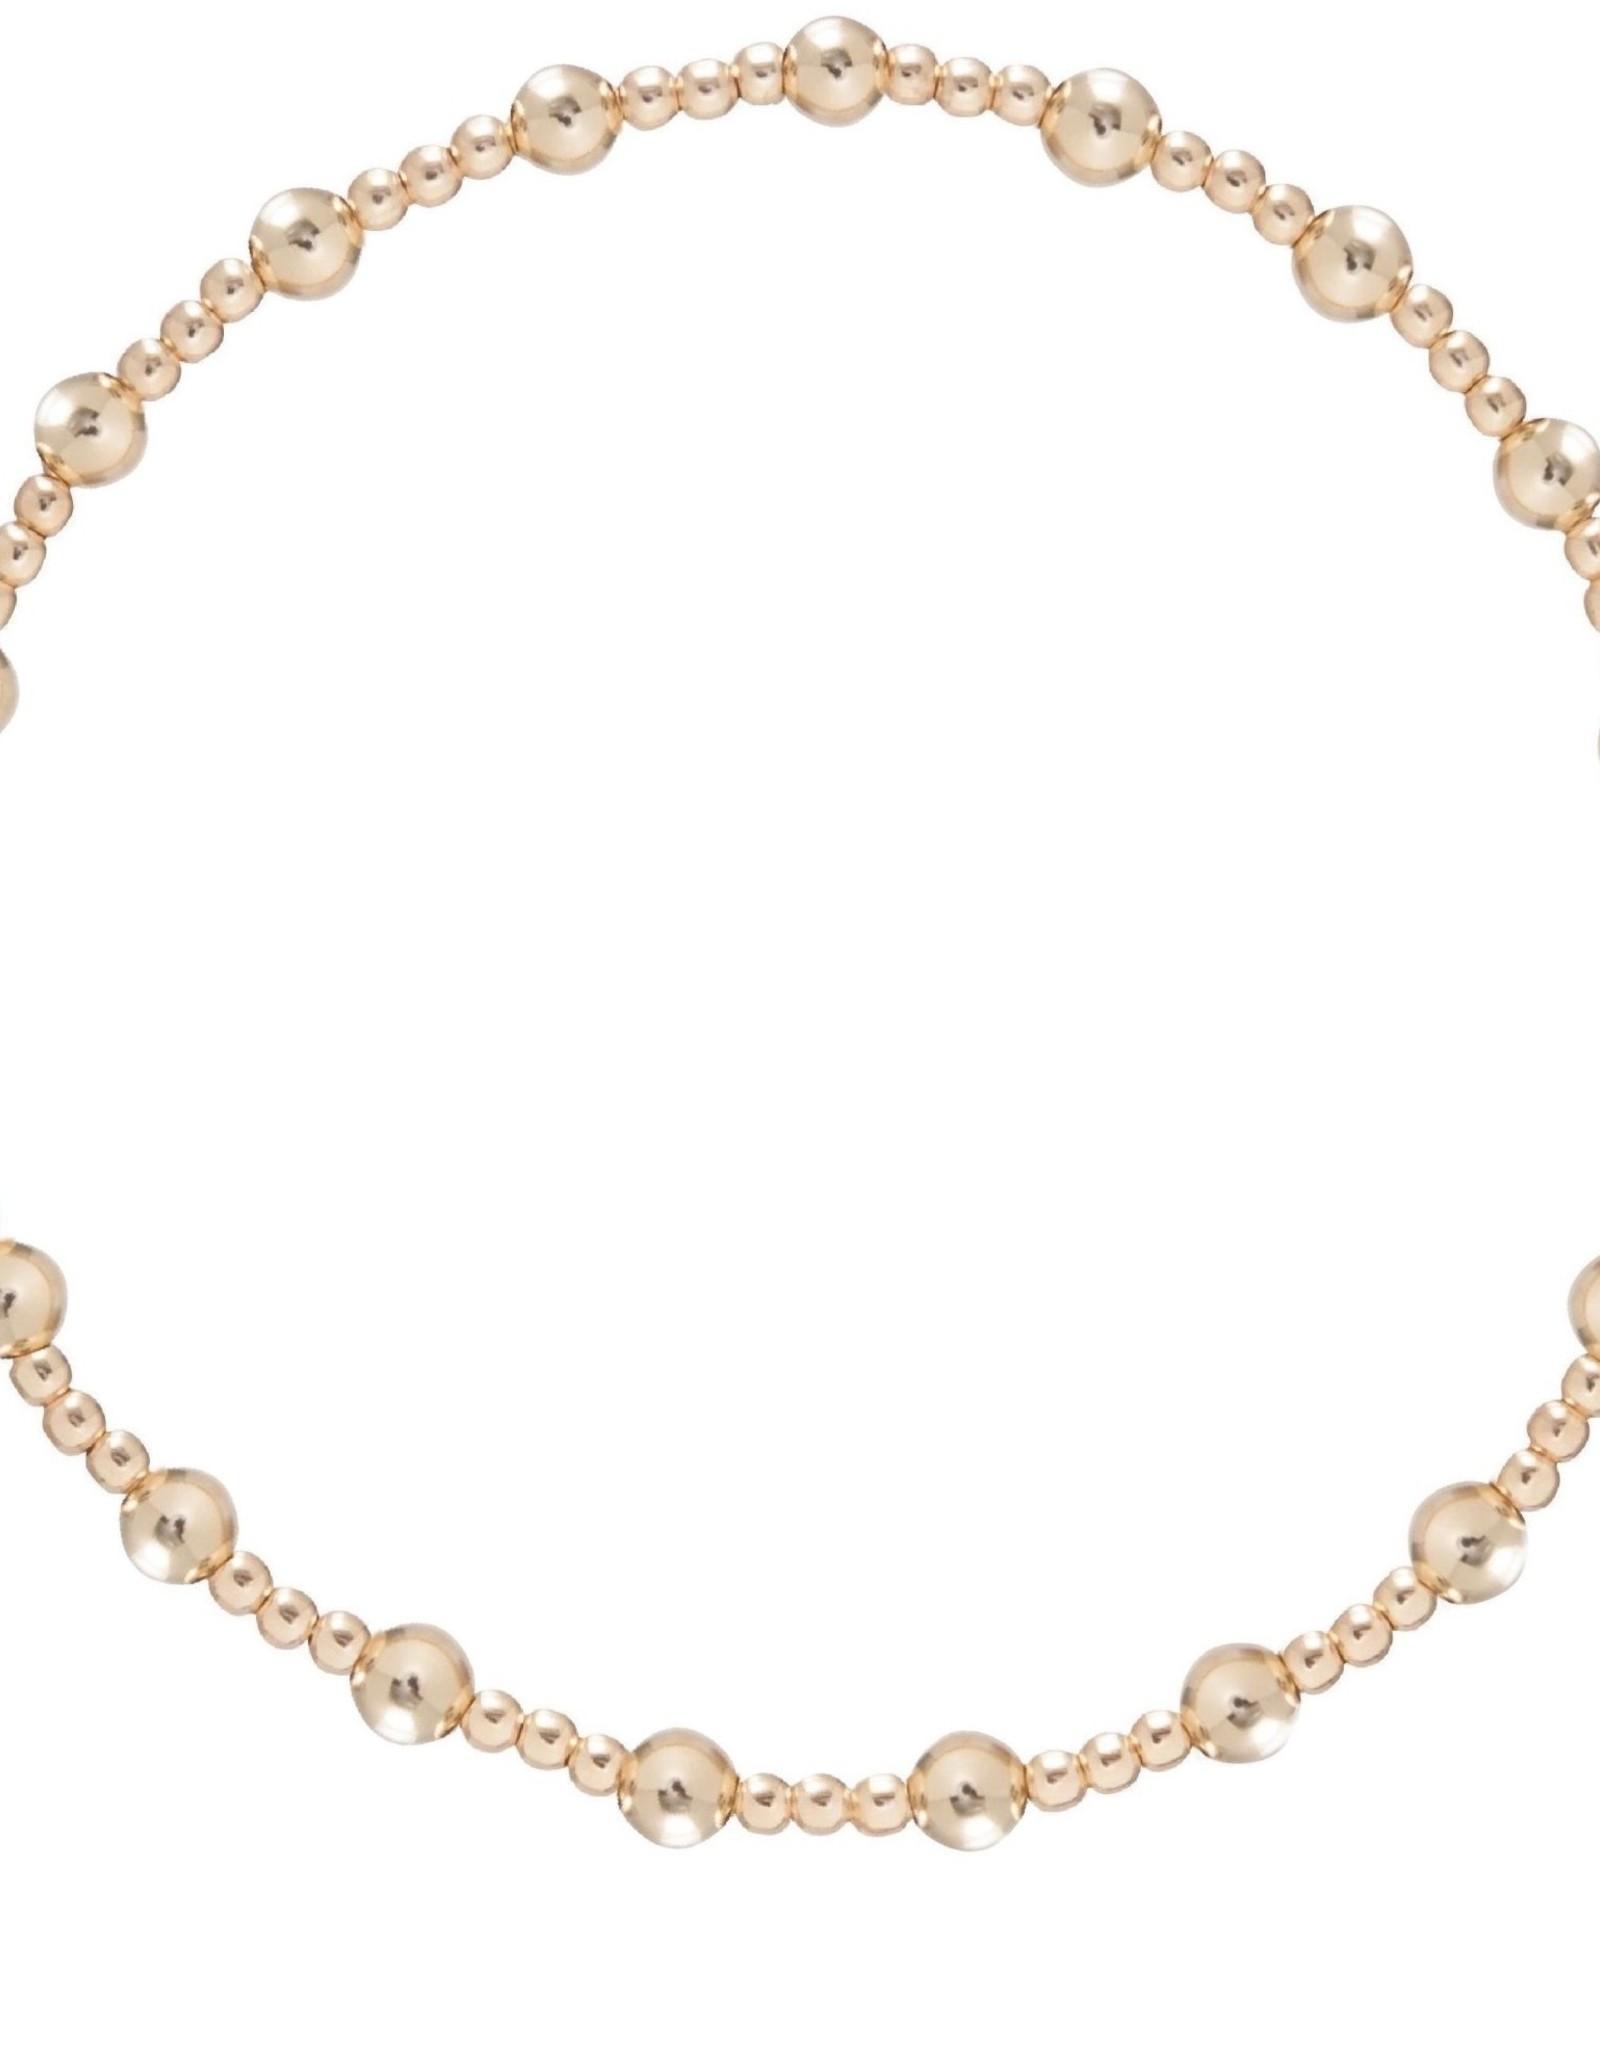 ENewton Design ENewton Classic Sincerity Bracelet